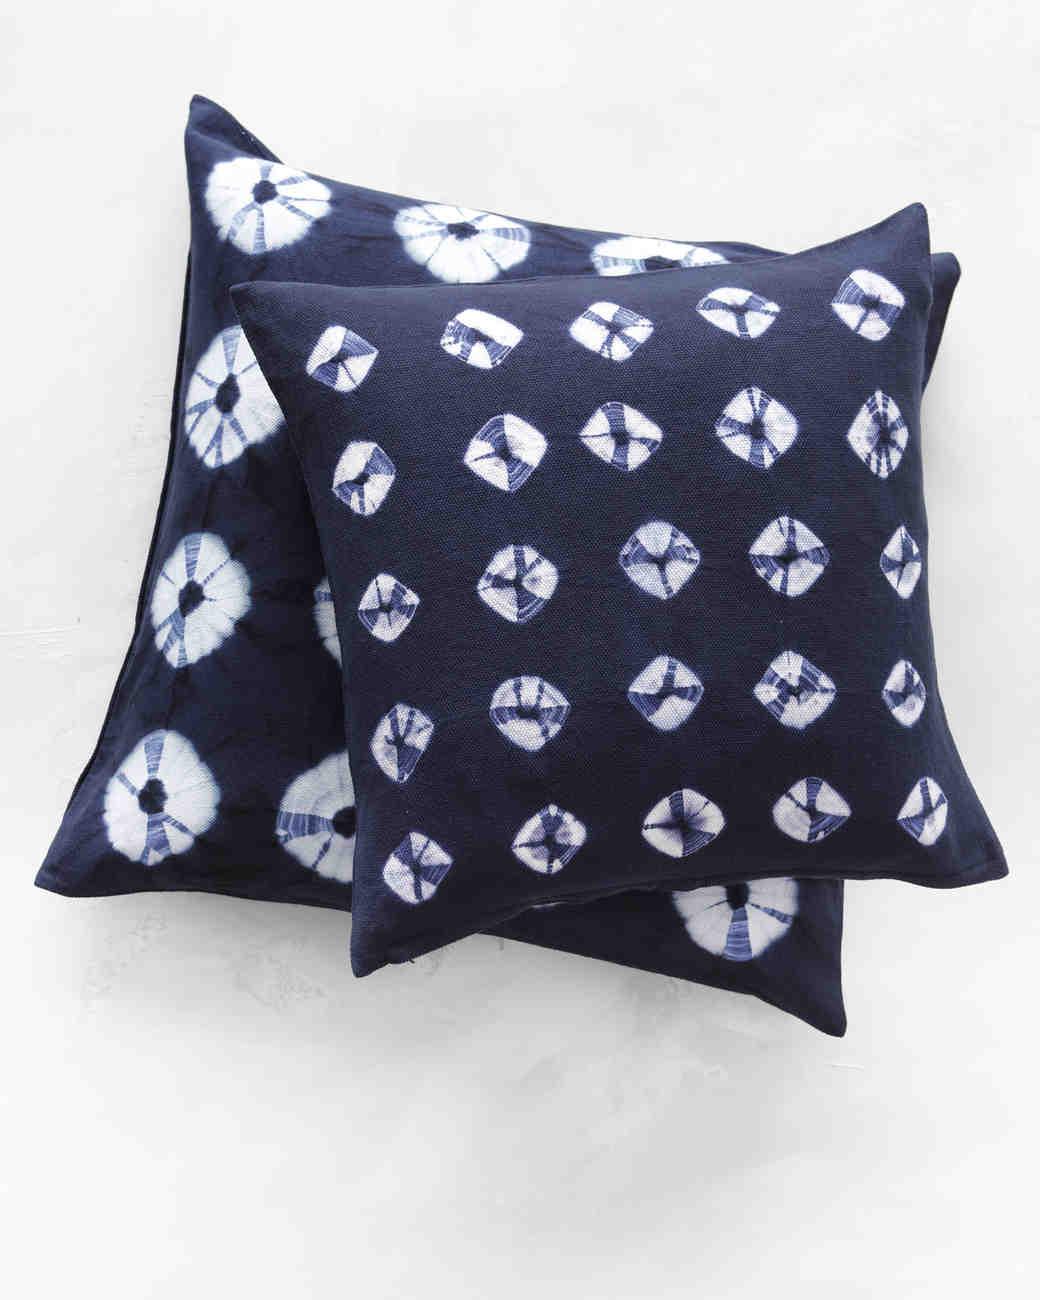 john-robshaw-pillows-mwd108187.jpg